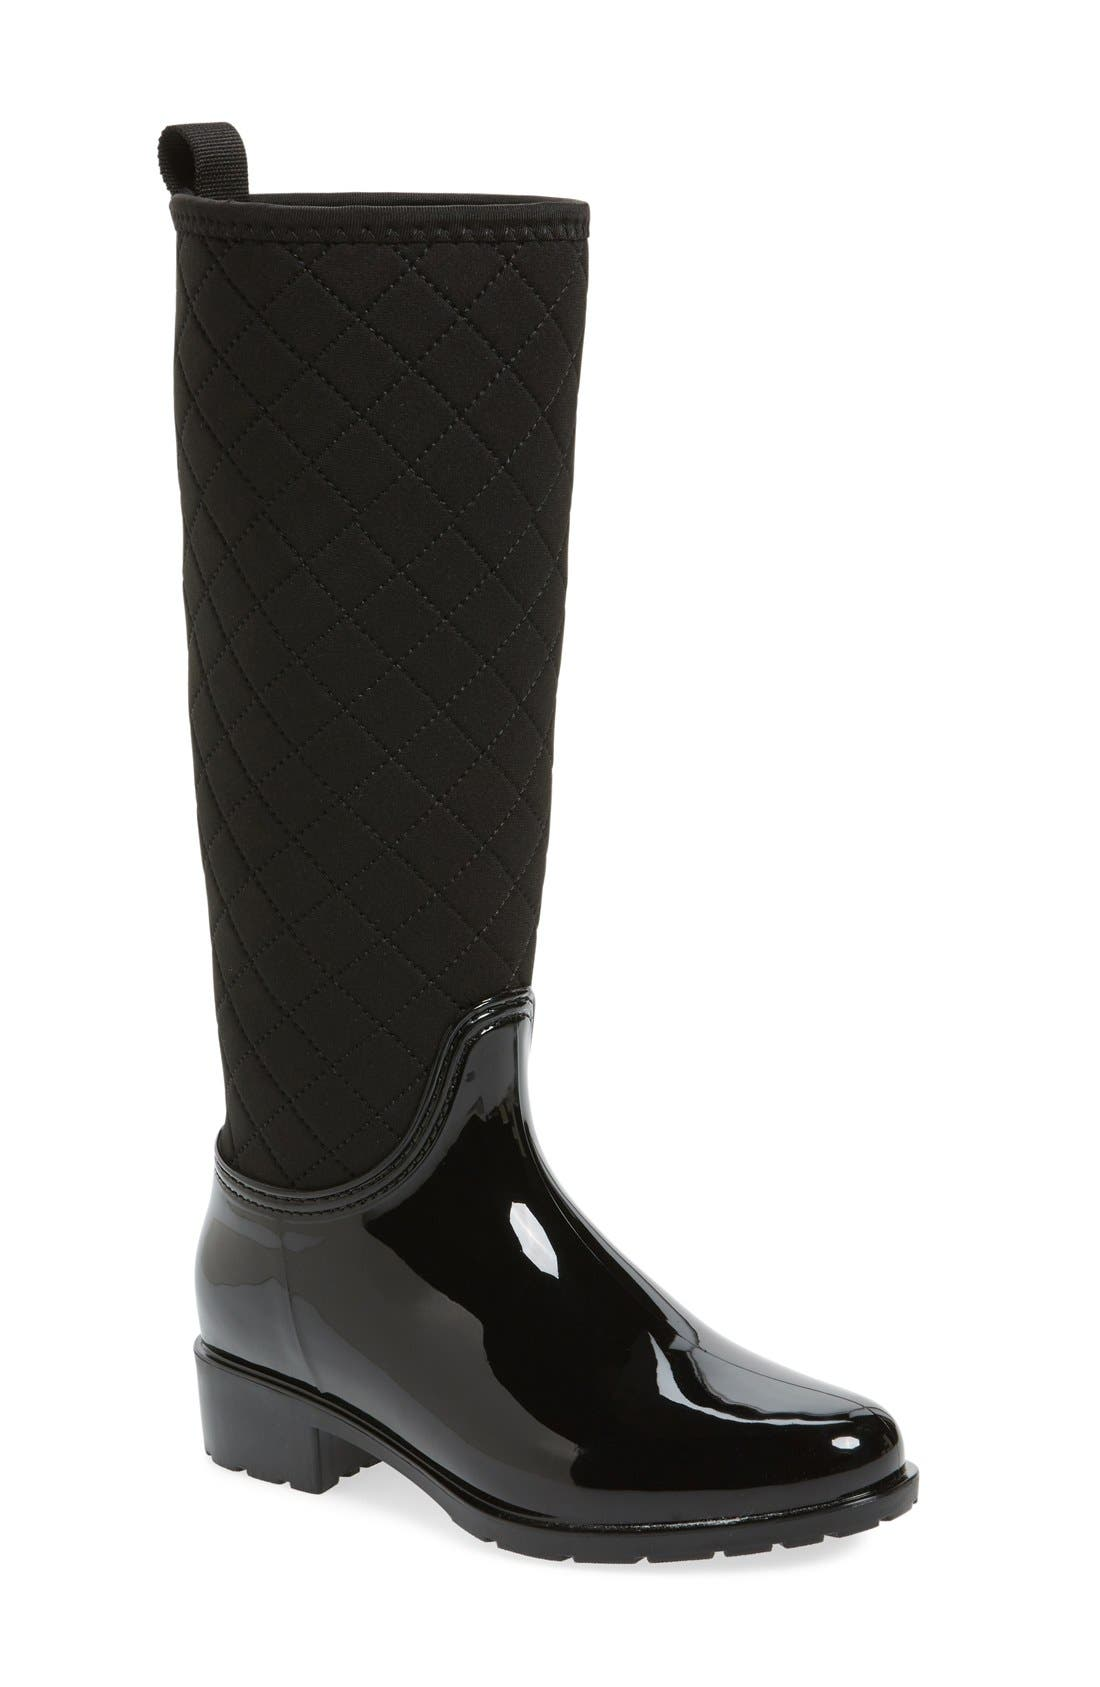 Parma Quilted Tall Waterproof Rain Boot,                             Main thumbnail 1, color,                             Black